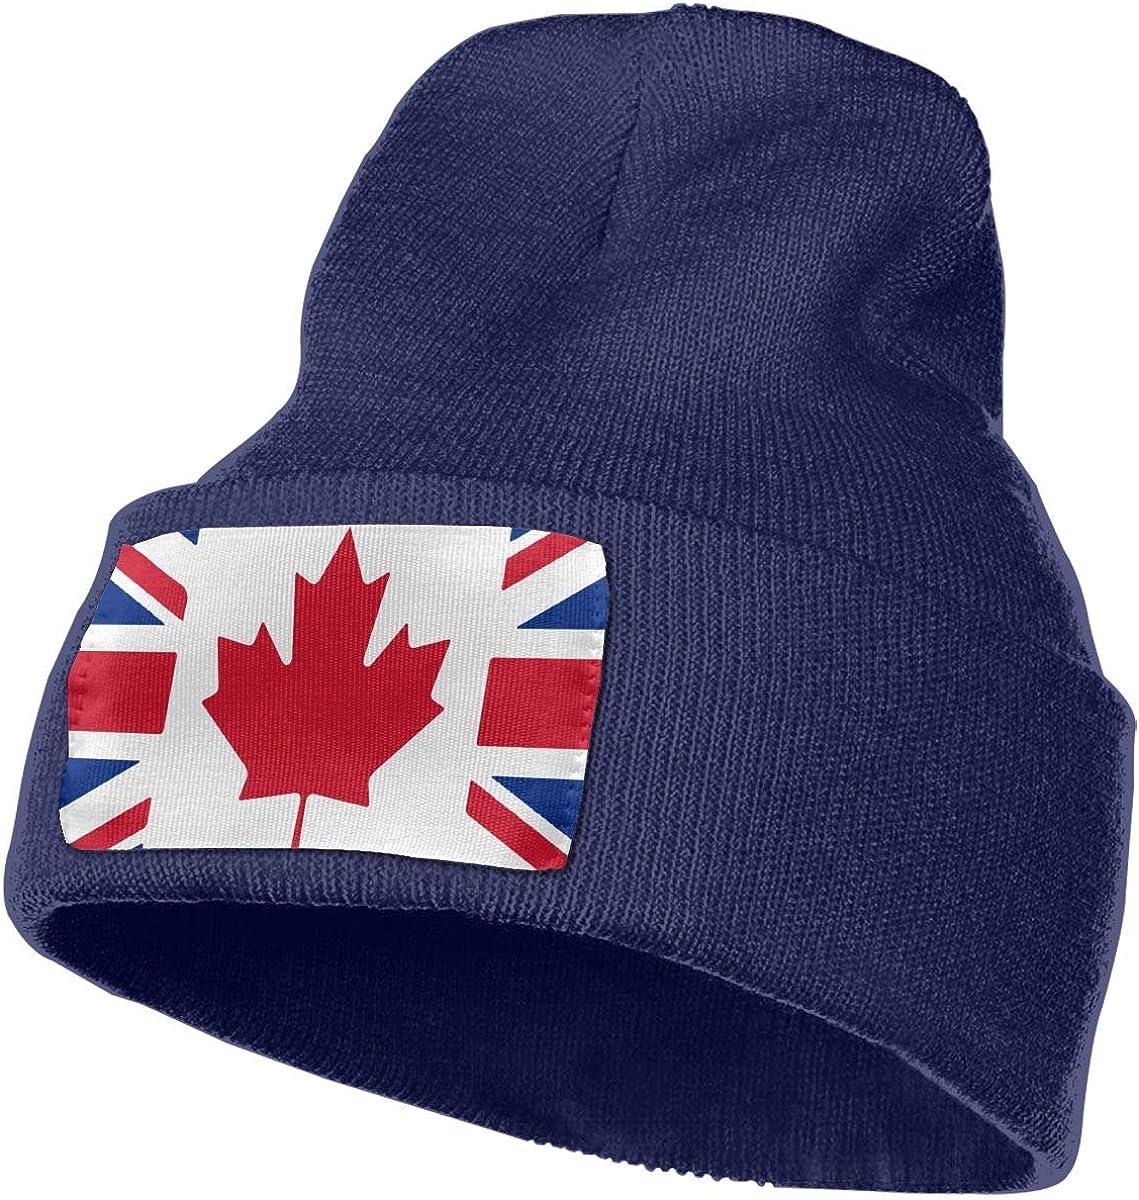 Flag Mashup Women and Men Skull Caps Winter Warm Stretchy Knitting Beanie Hats U.K TAOMAP89 Canada